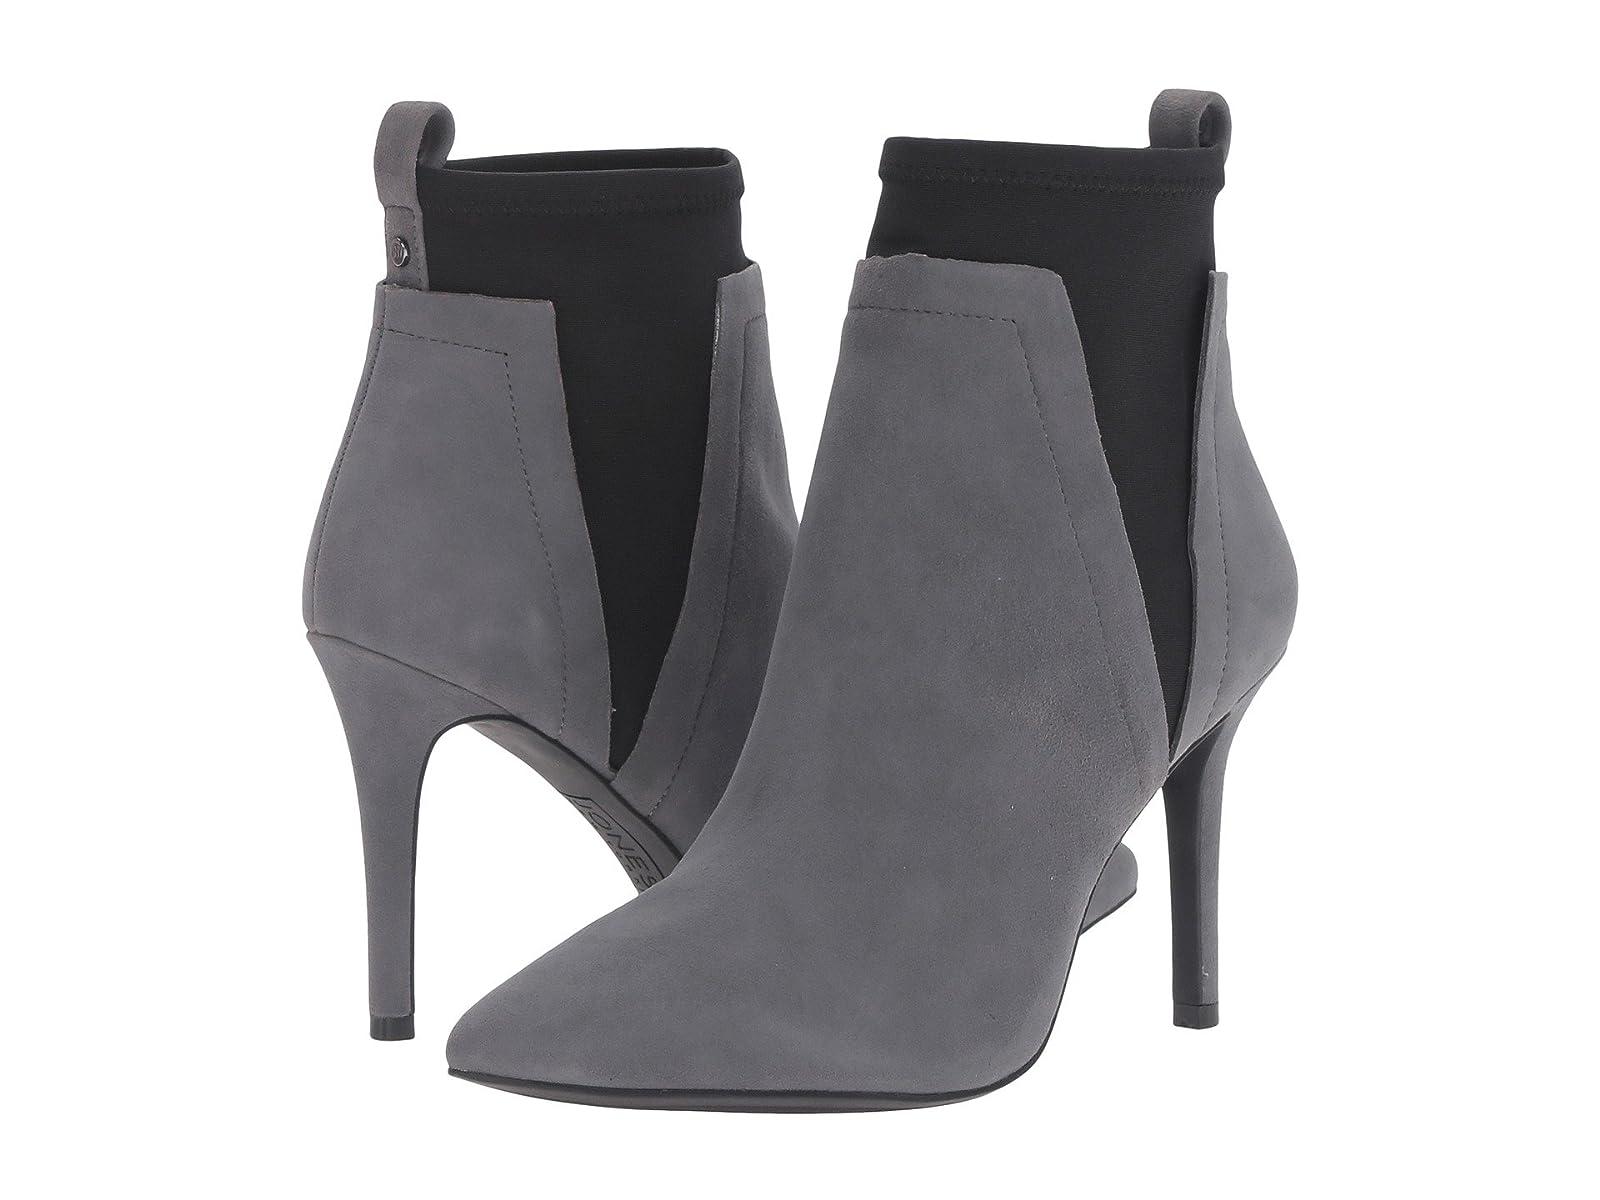 Jones New York AshleyCheap and distinctive eye-catching shoes